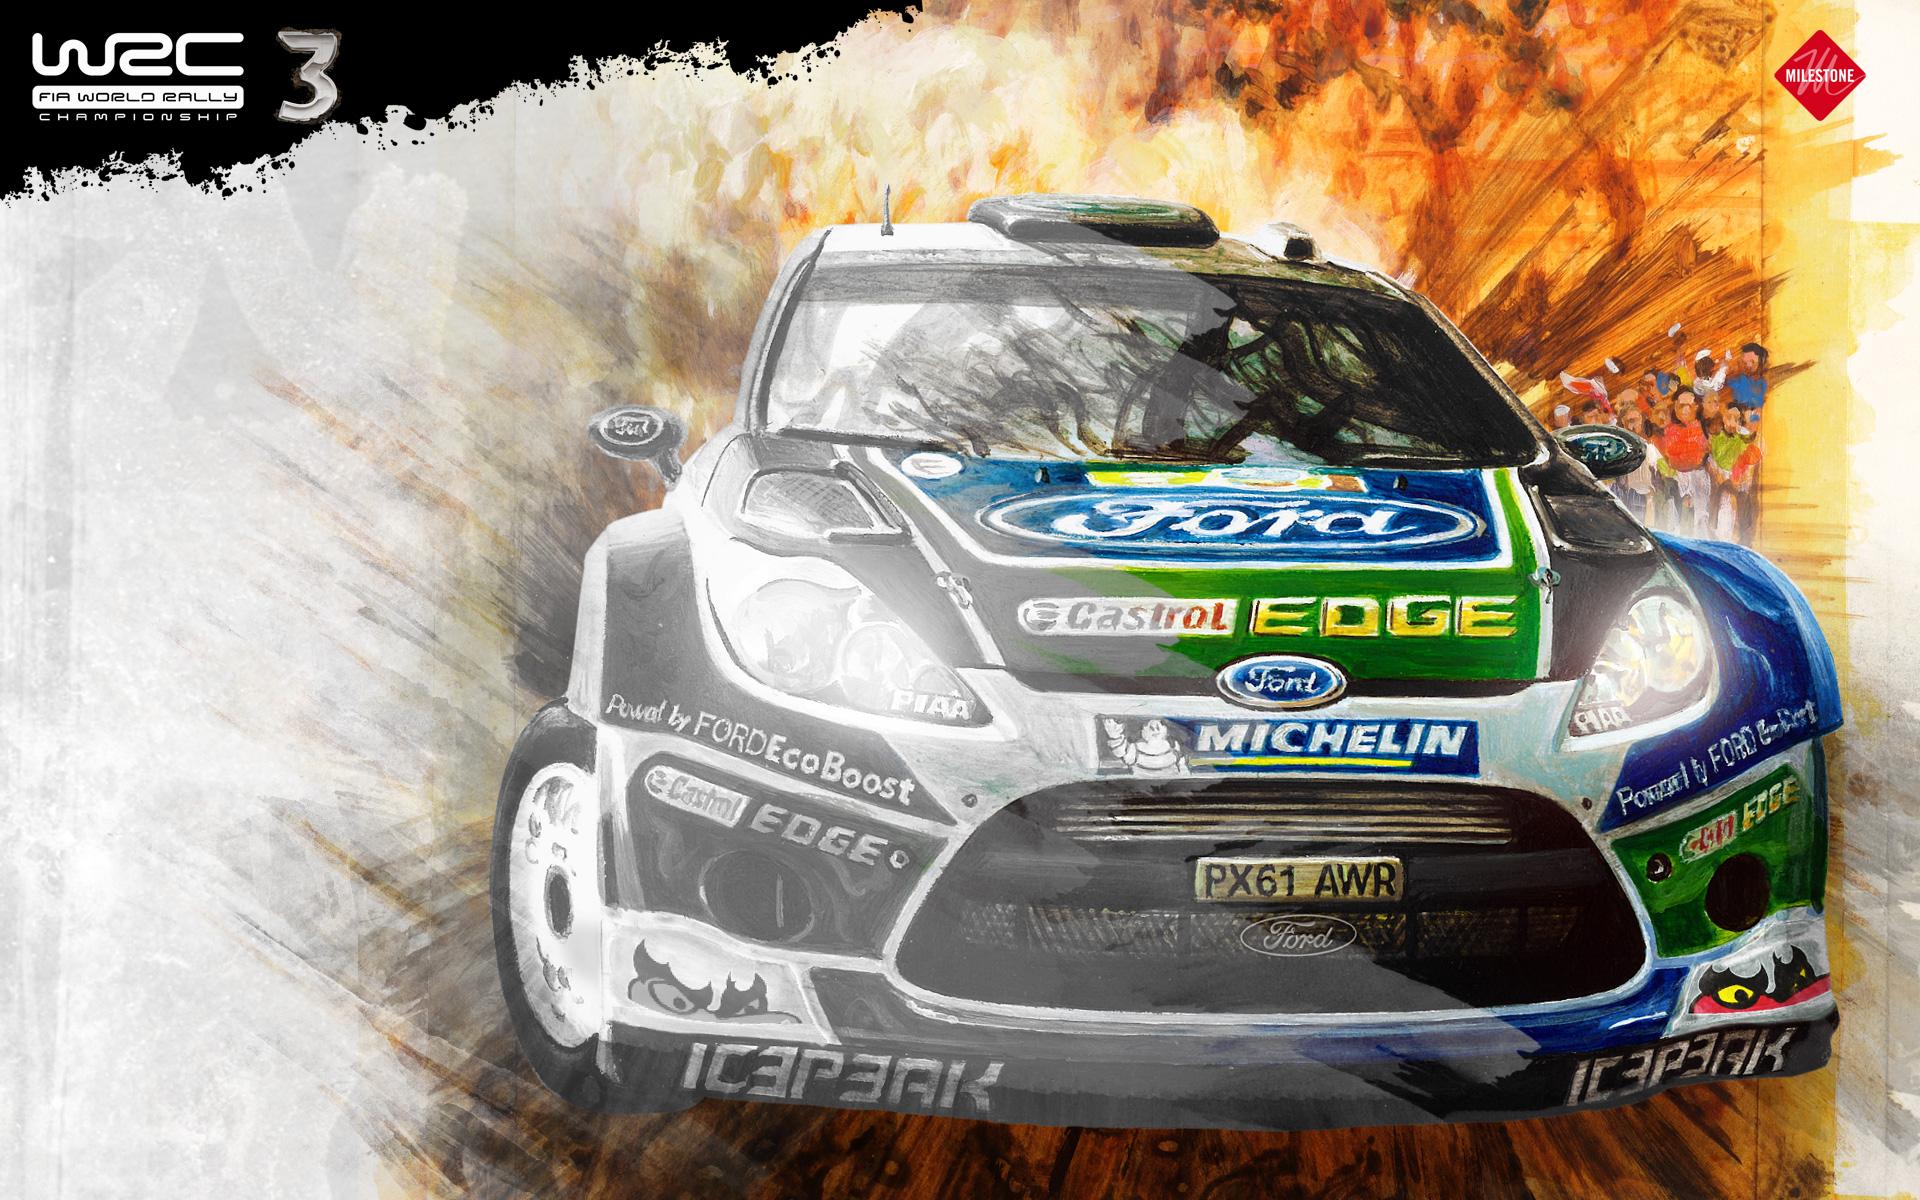 Behind the scenes of WRC3's alluring artwork